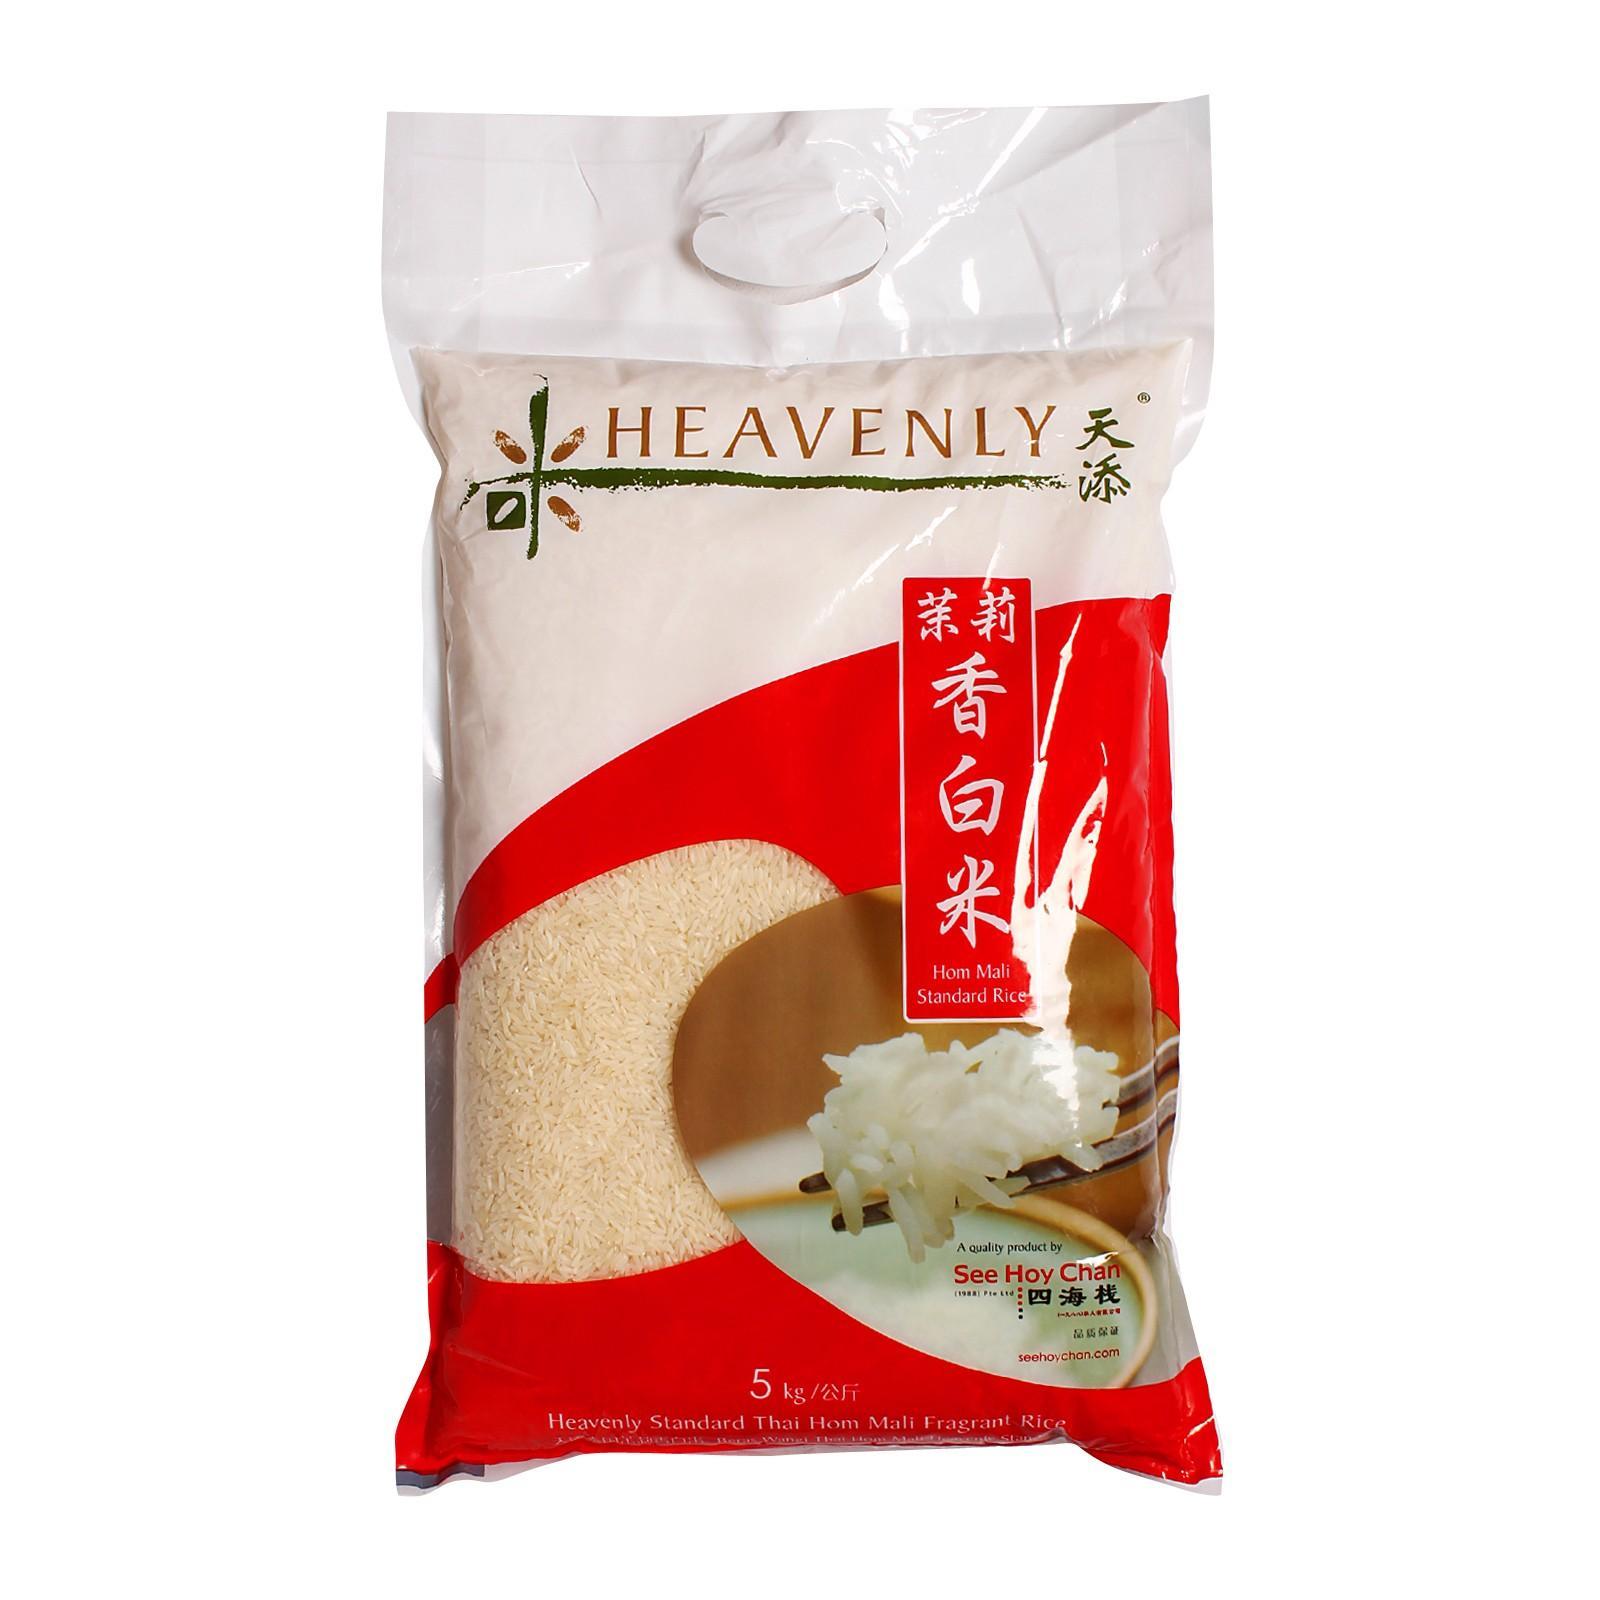 Heavenly Standard Thai Hom Mali Fragrant Rice